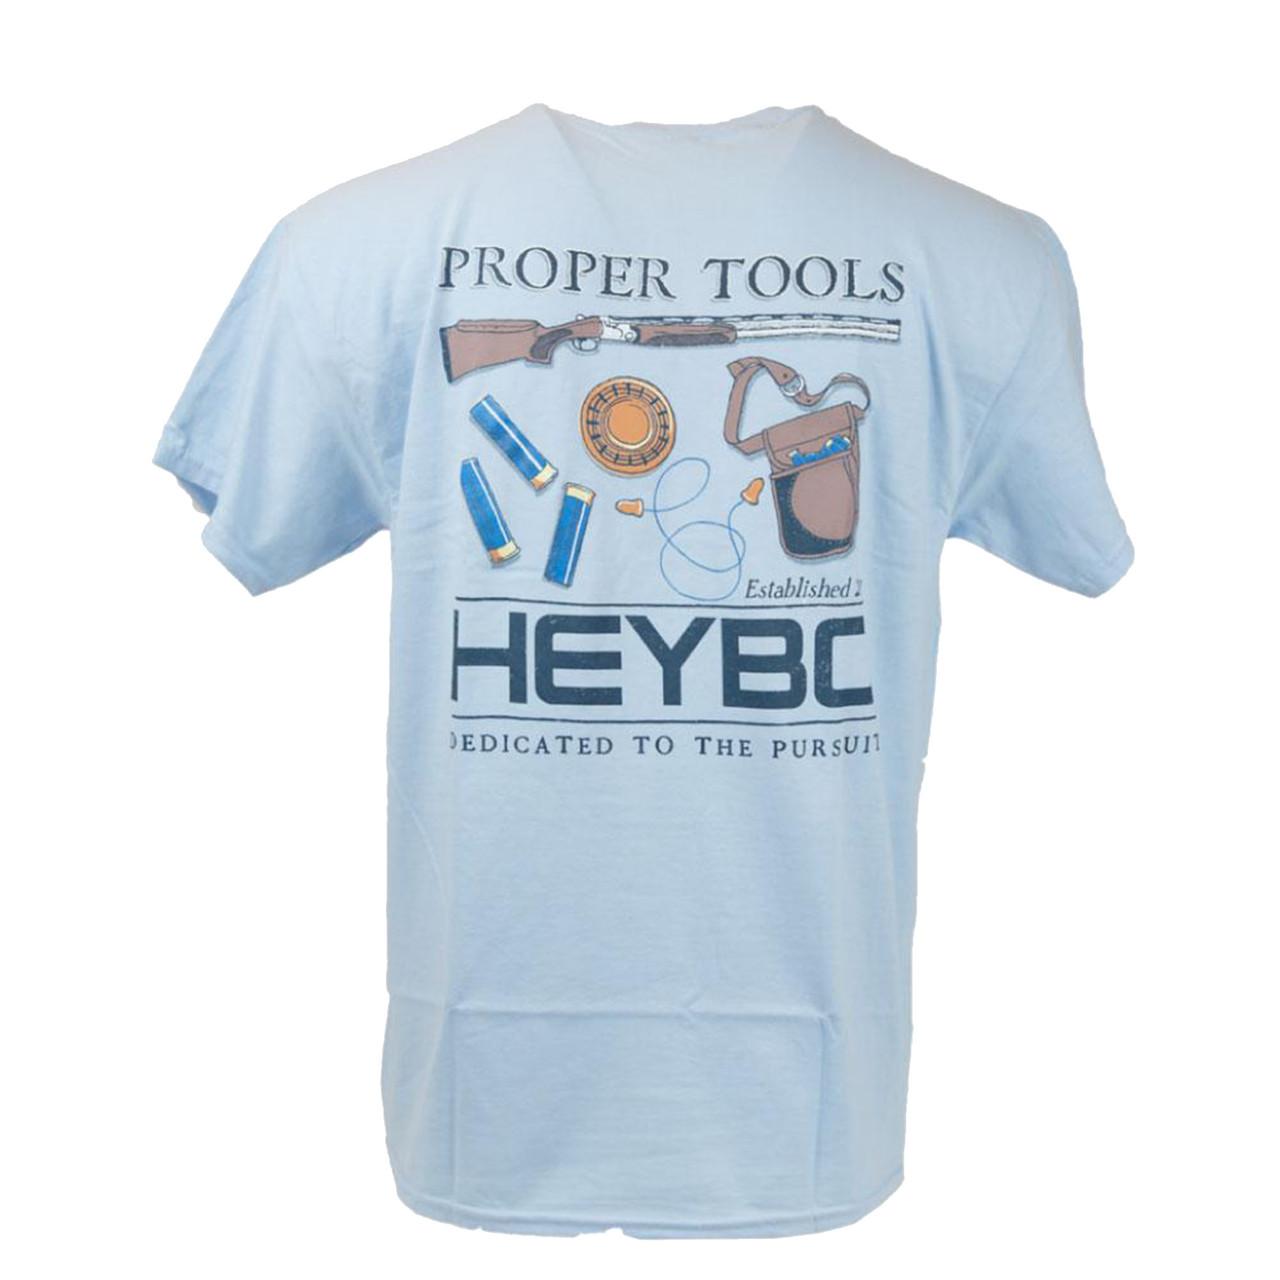 7b94eaa3f Heybo Outdoors Proper Tools Youth Short Sleeve T-shirt - Trenz Shirt ...